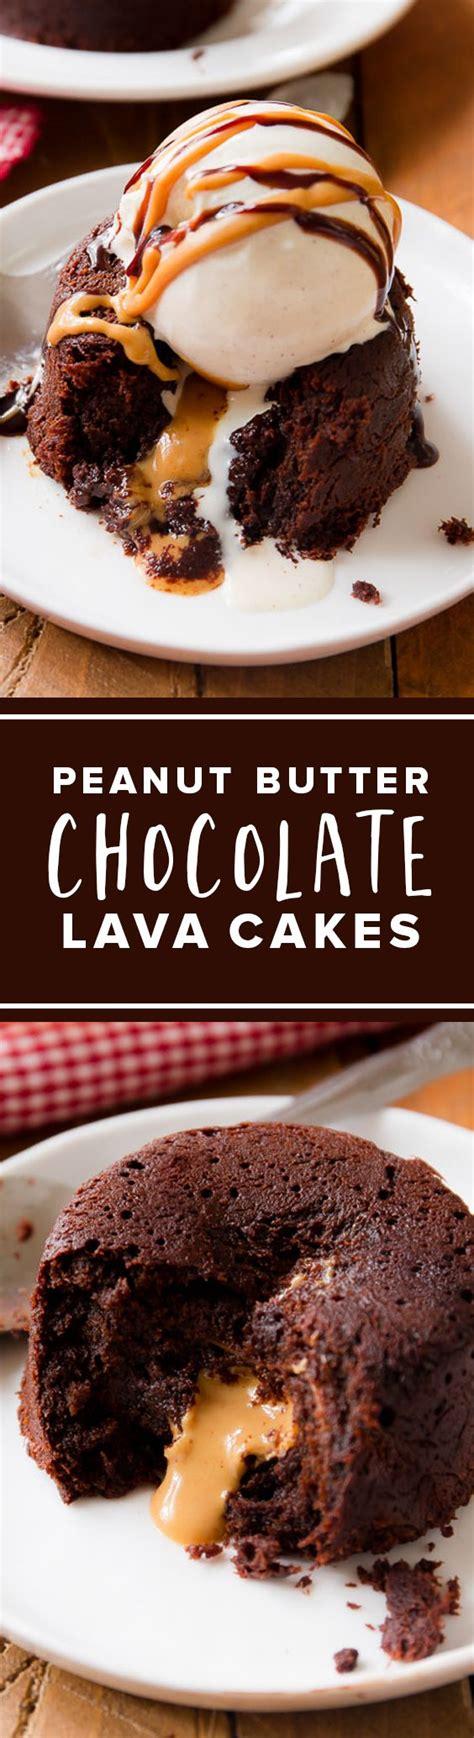 peanut butter chocolate lava cakes sallys baking addiction